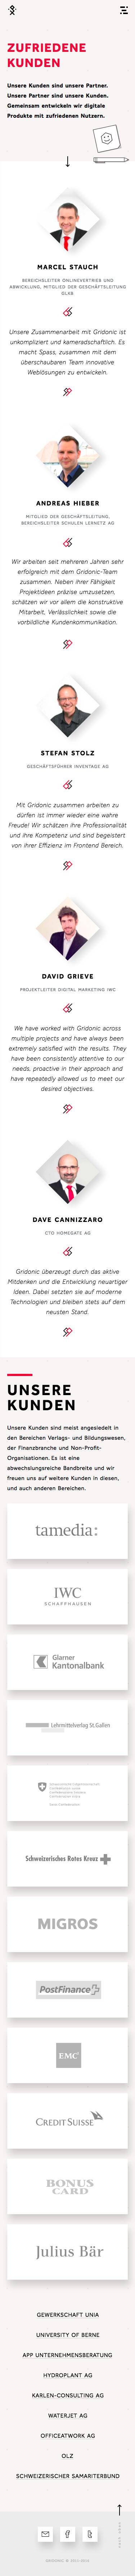 Gridonic 09